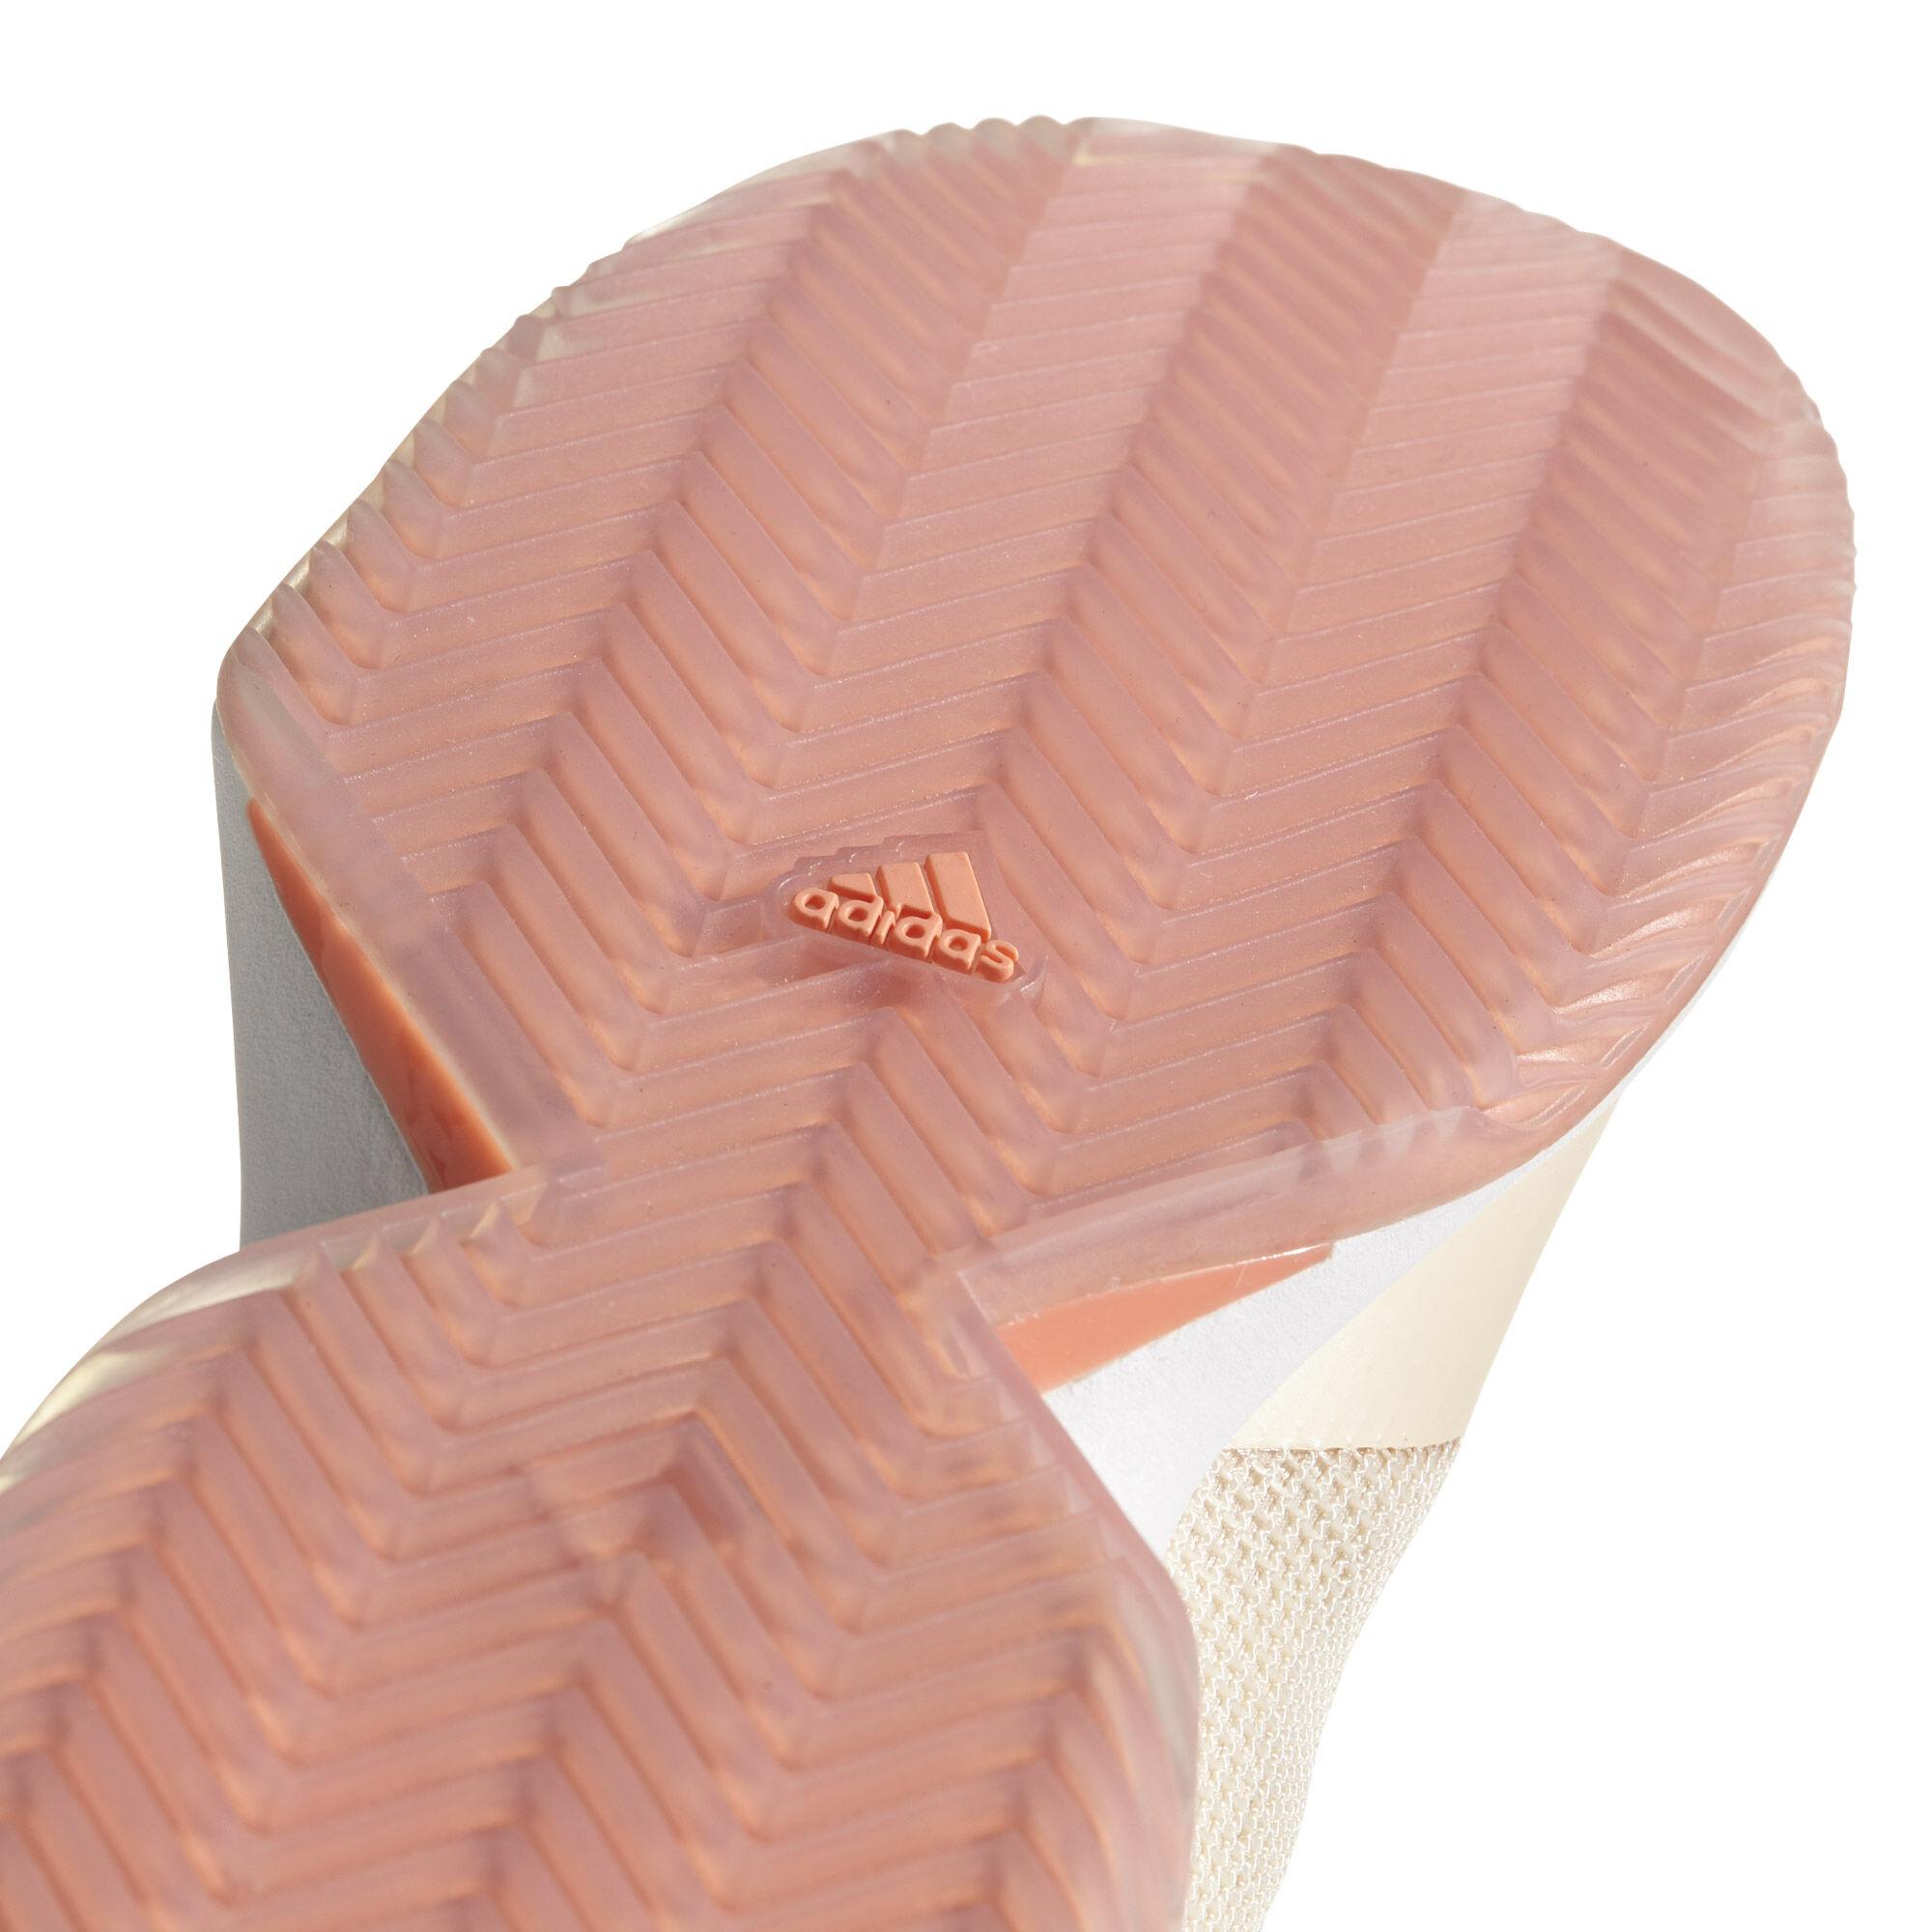 separation shoes 17677 991b5 ... adidas adidas adidas adidas. Adizero Ubersonic 3 Clay ...